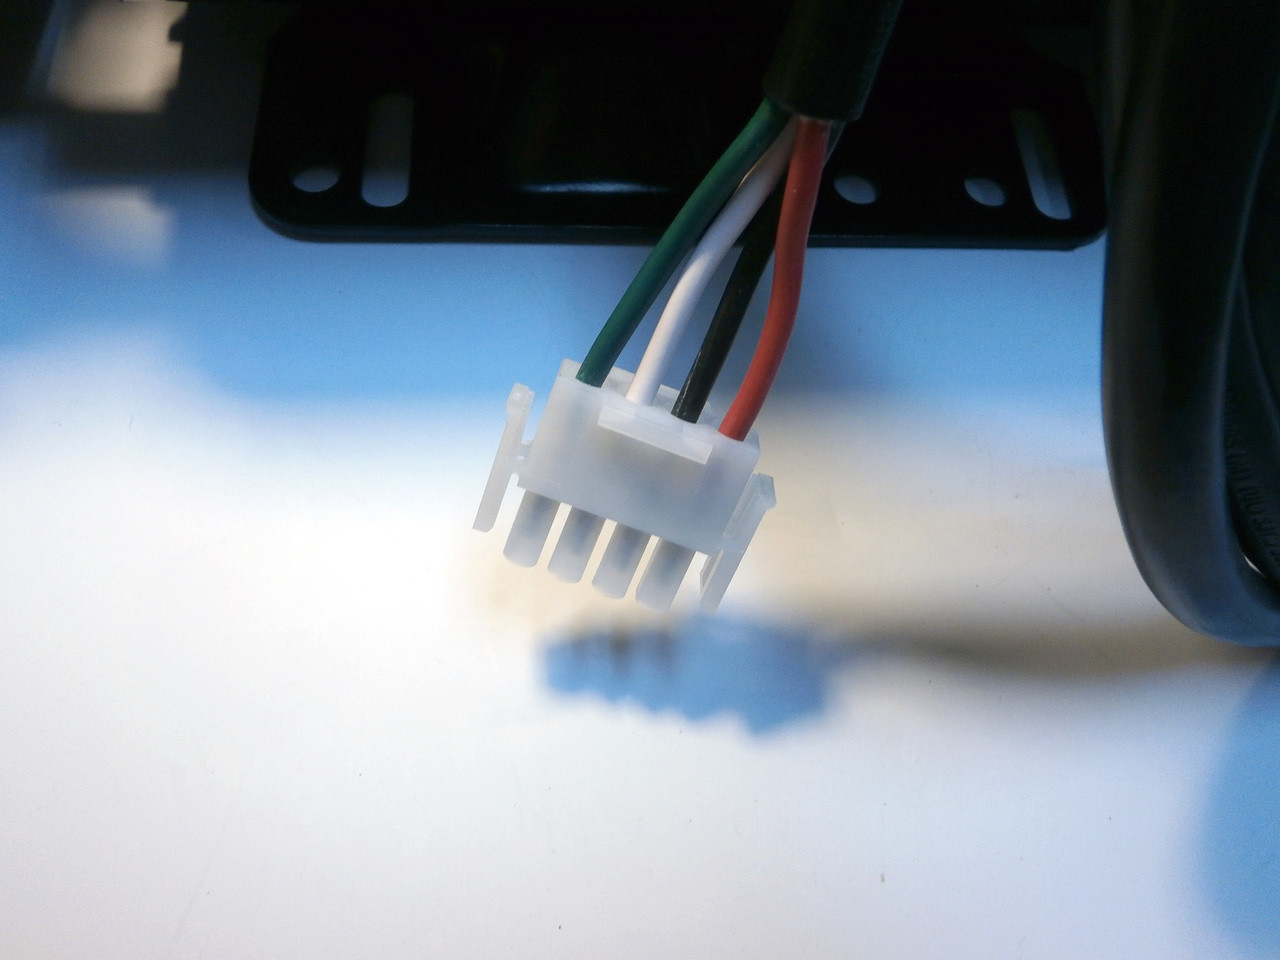 X321180 - Plug View